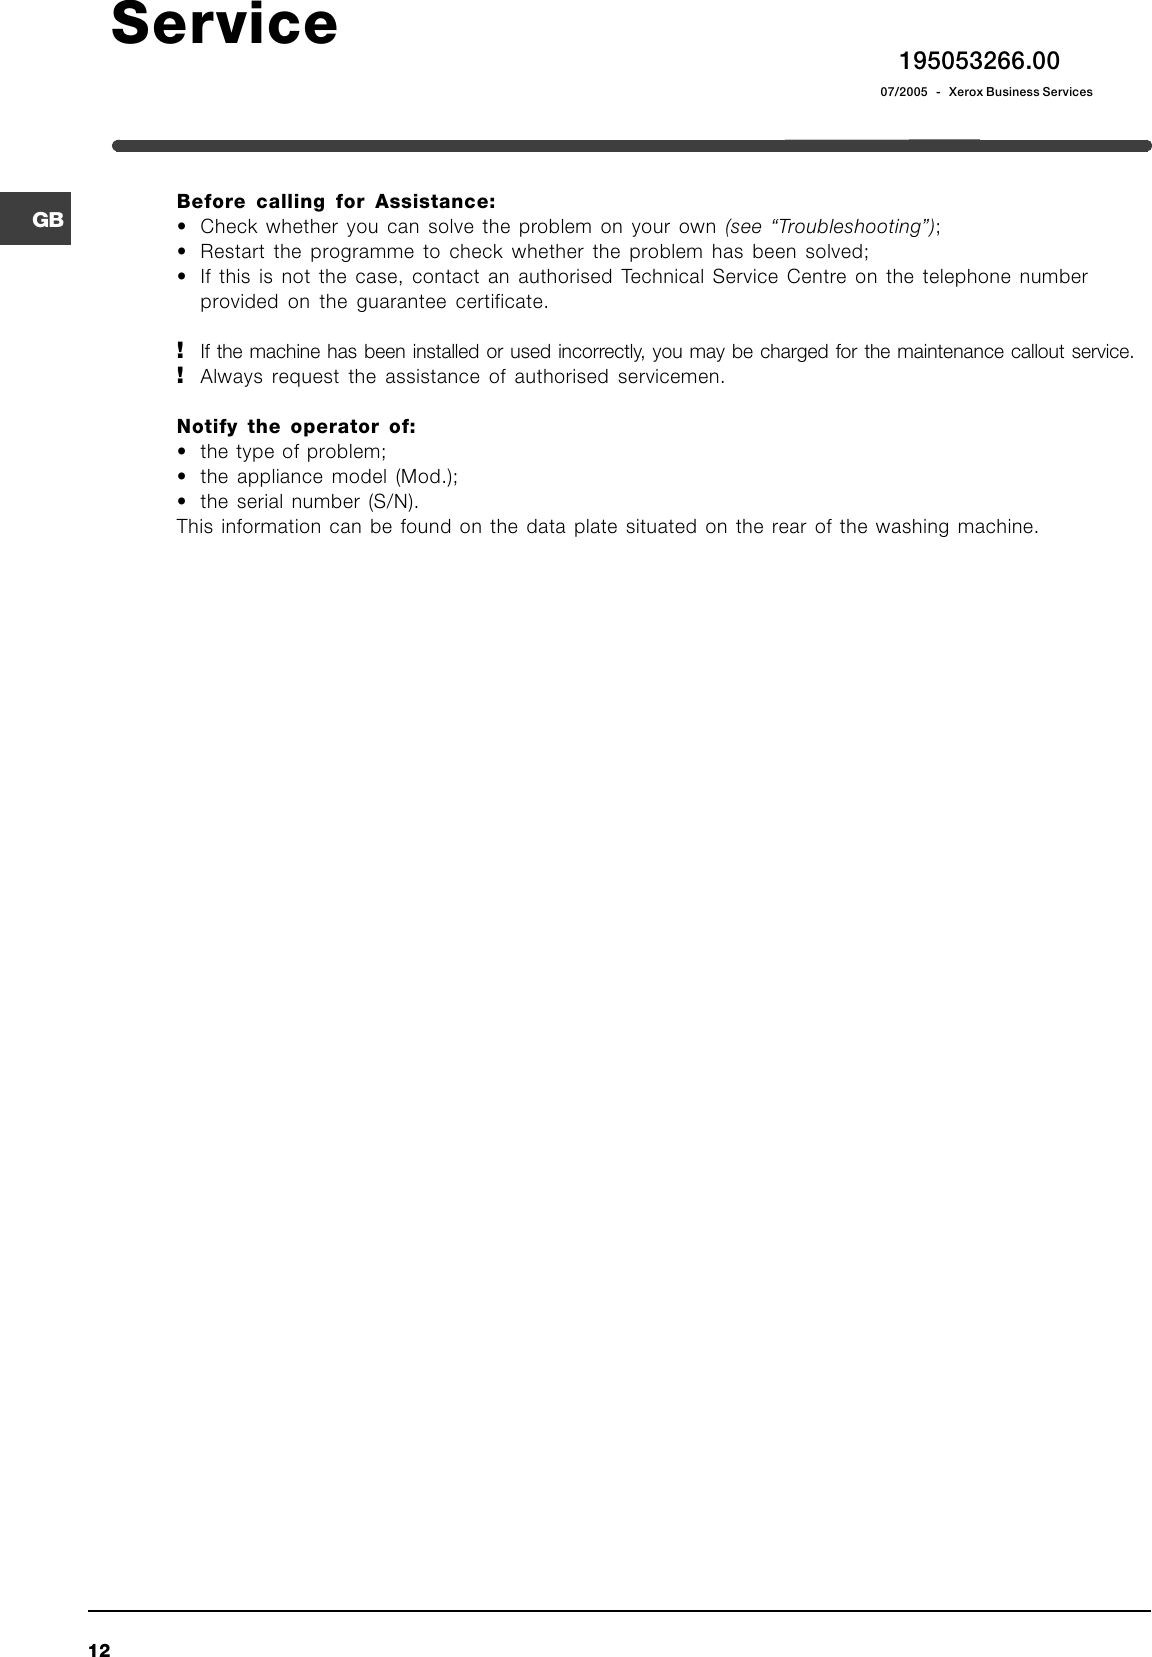 Indesit washing machine symbols image collections symbol and indesit washing machine wixl 1200 ot instruction manual gbwixl page 12 of indesit indesit washing machine fandeluxe Choice Image